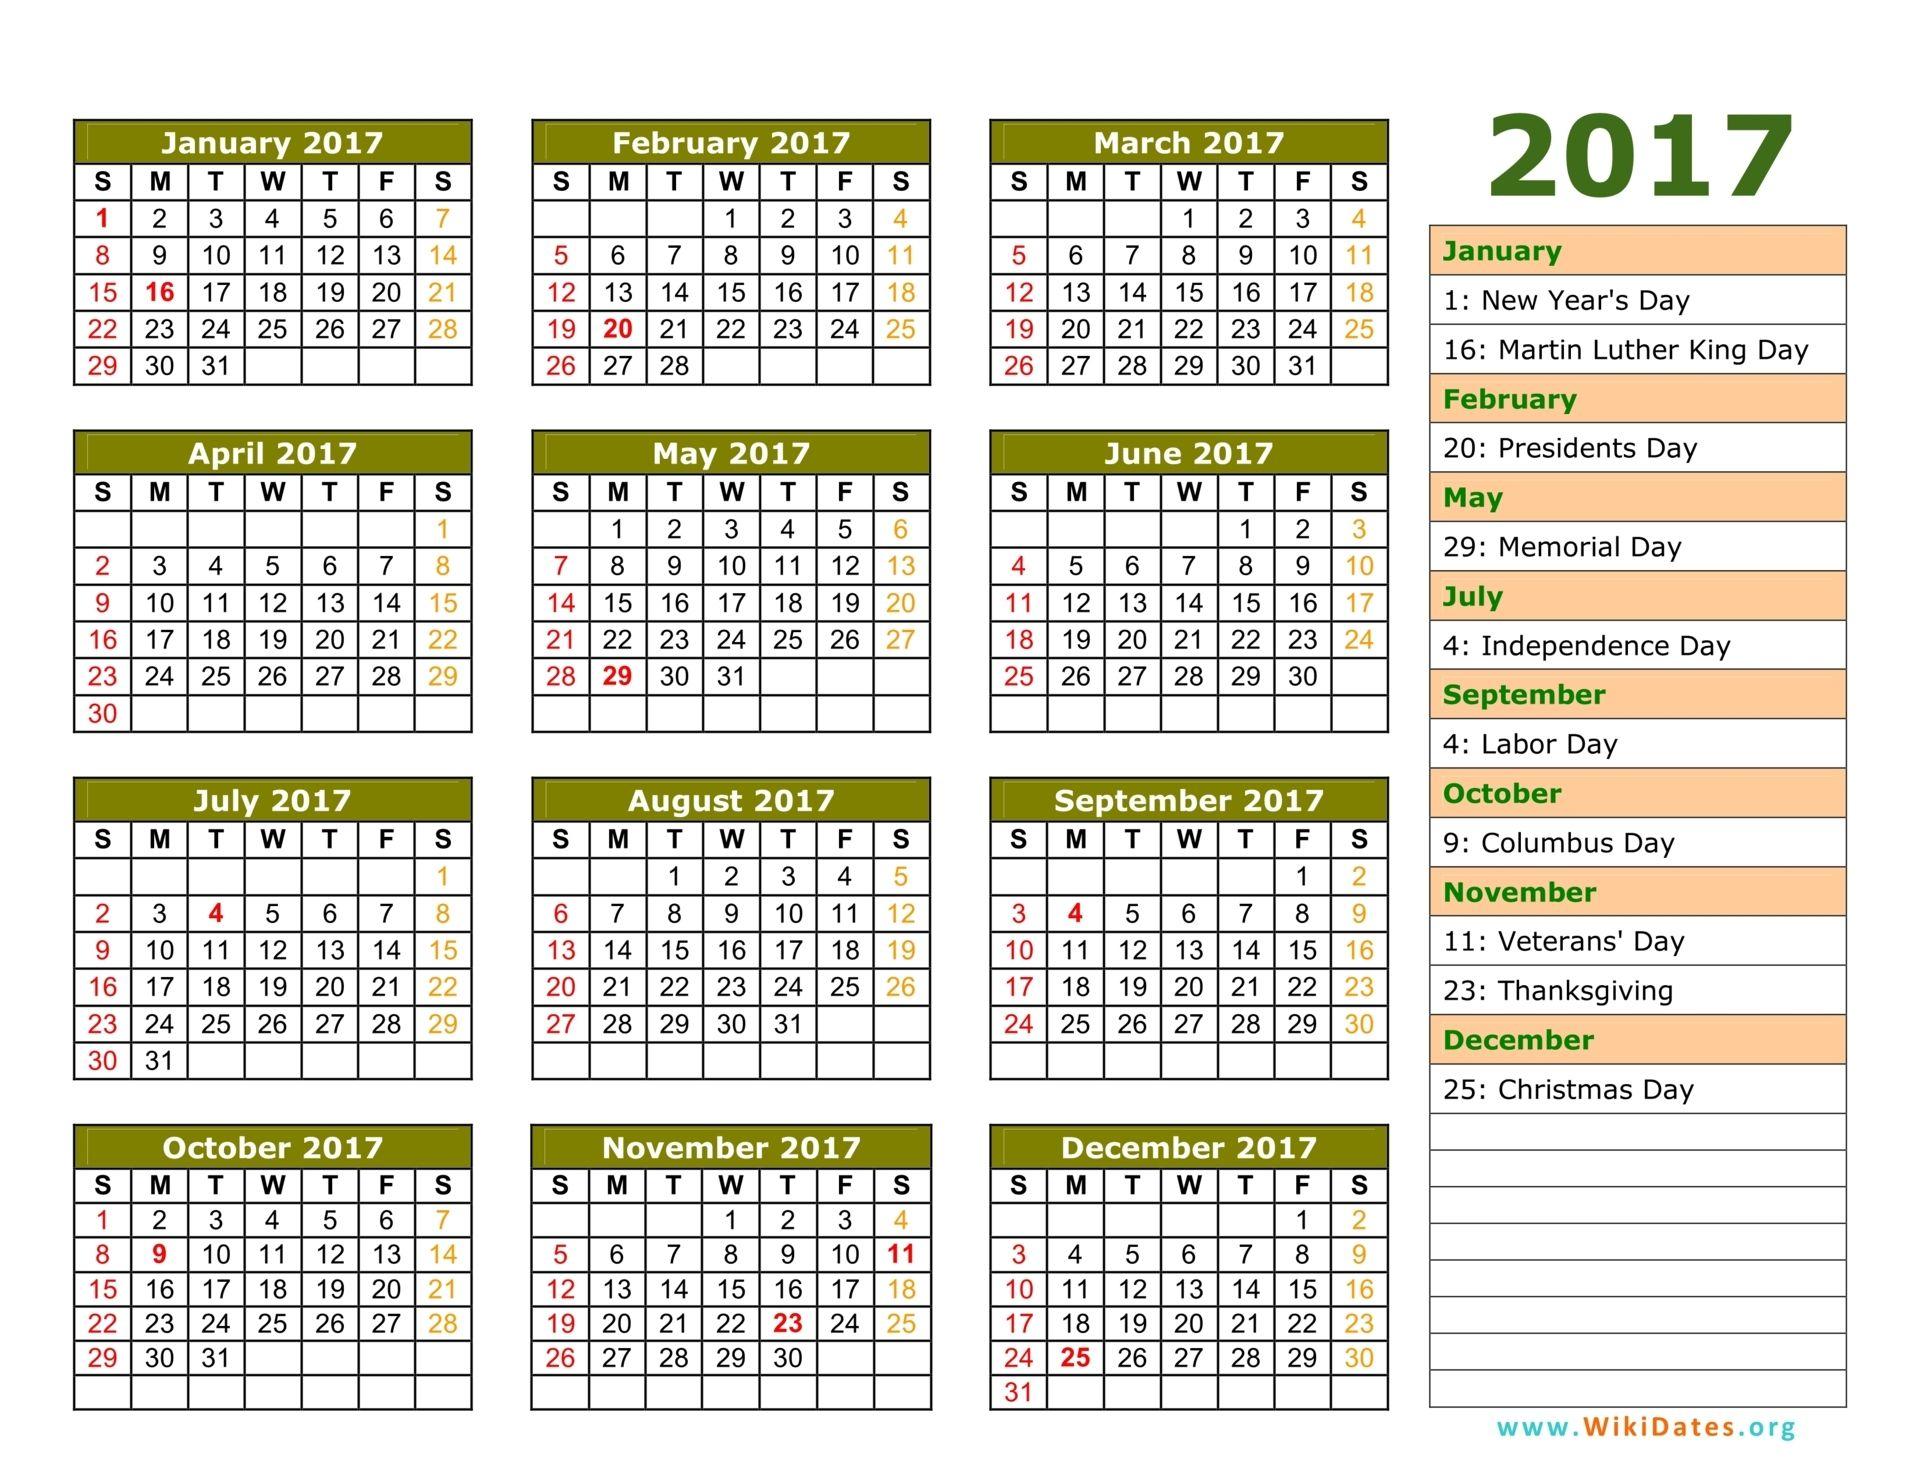 2017 Calendar With Holidays 2017 Calendar With Holidays